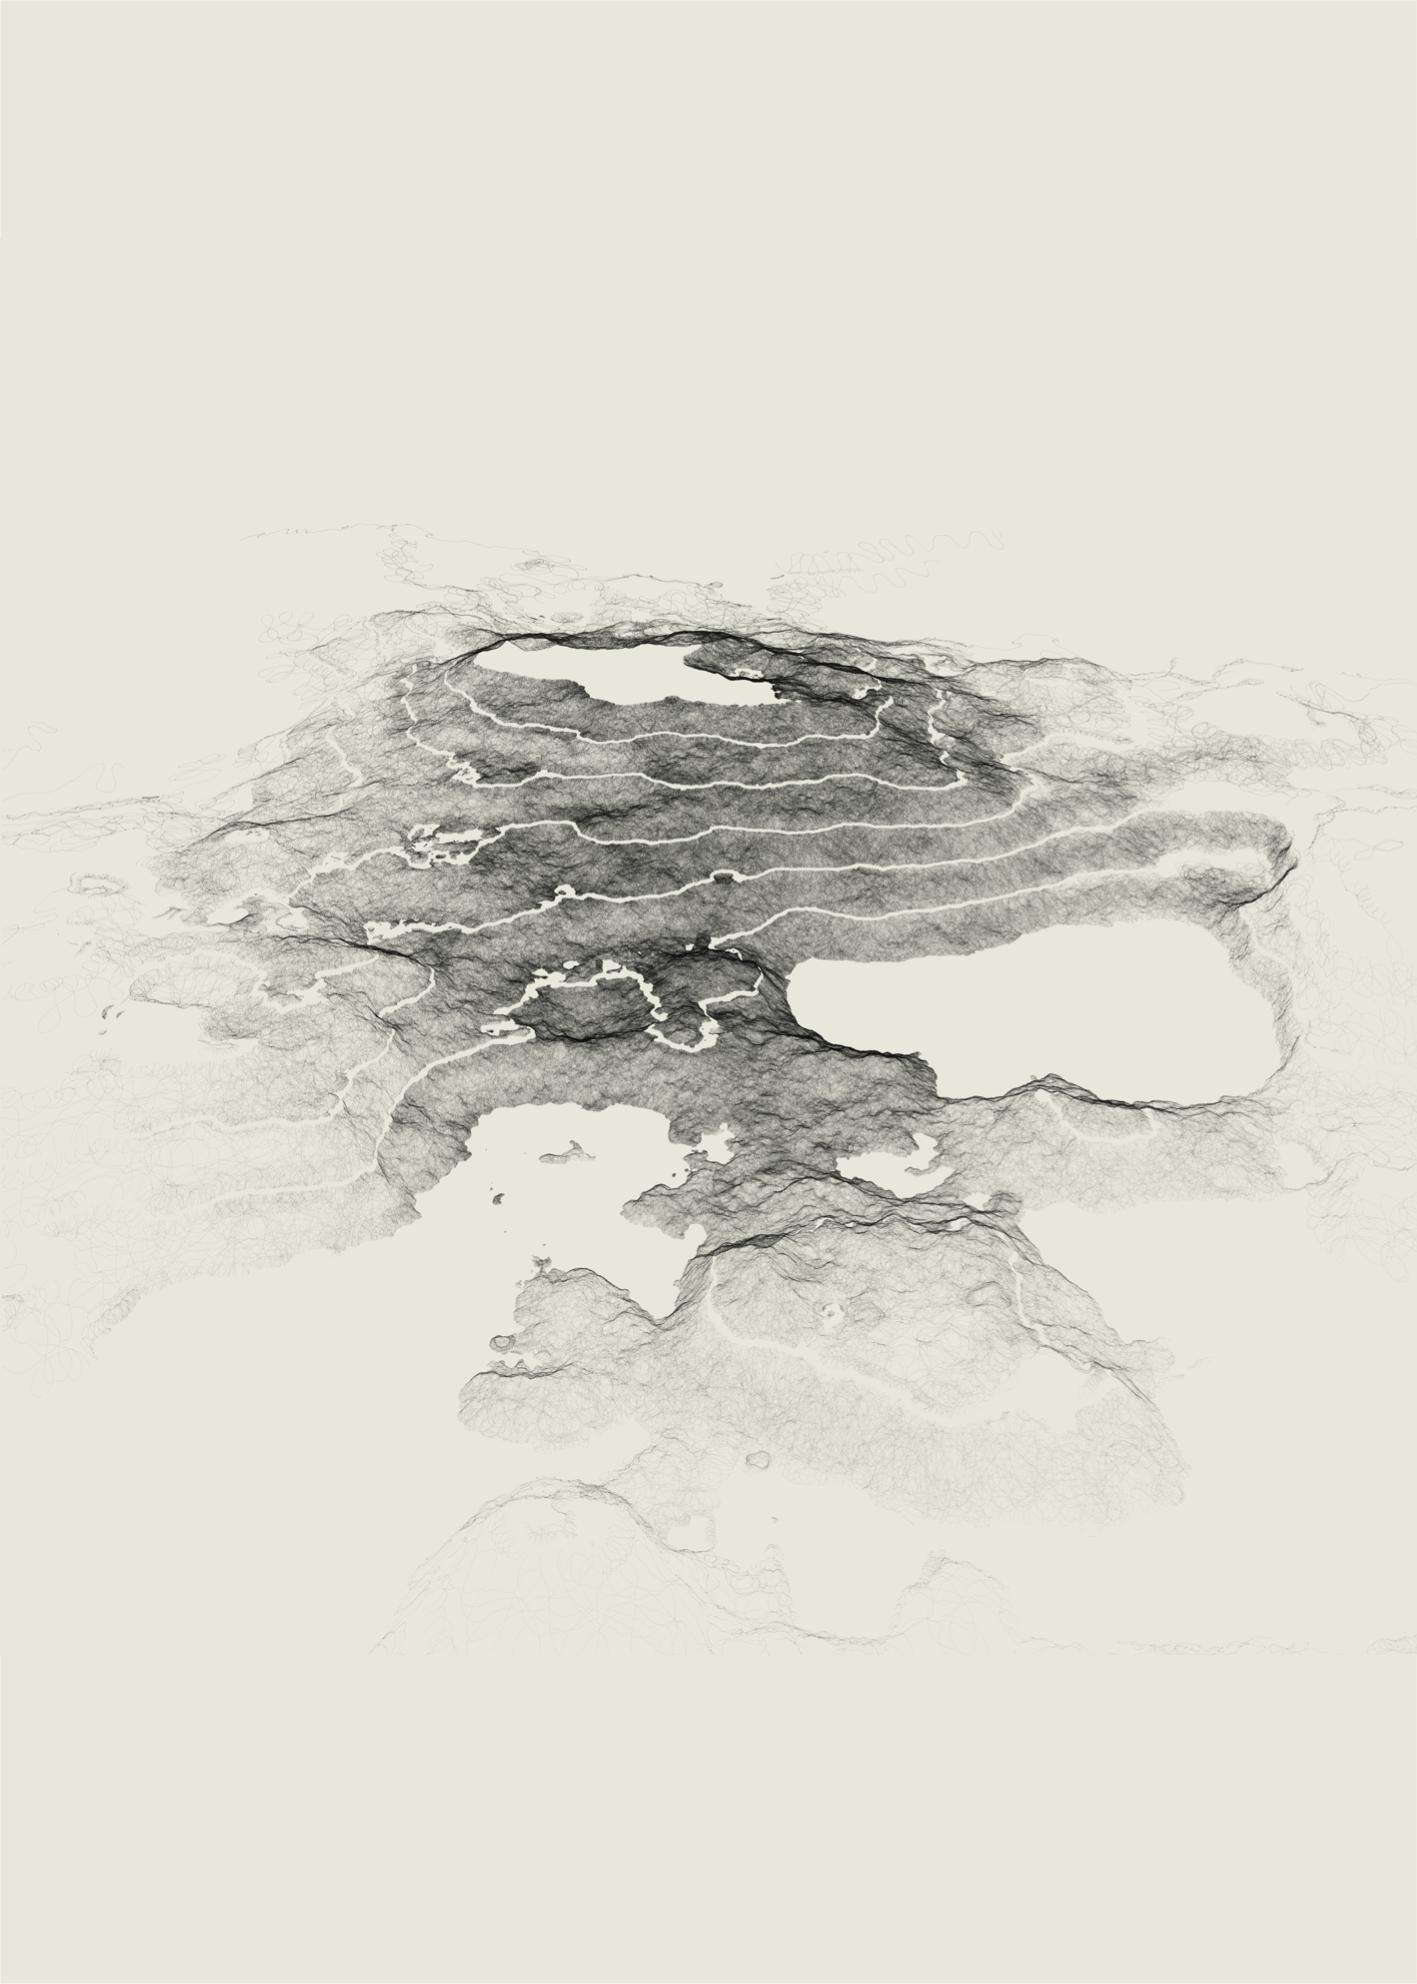 Image of Curvescape II